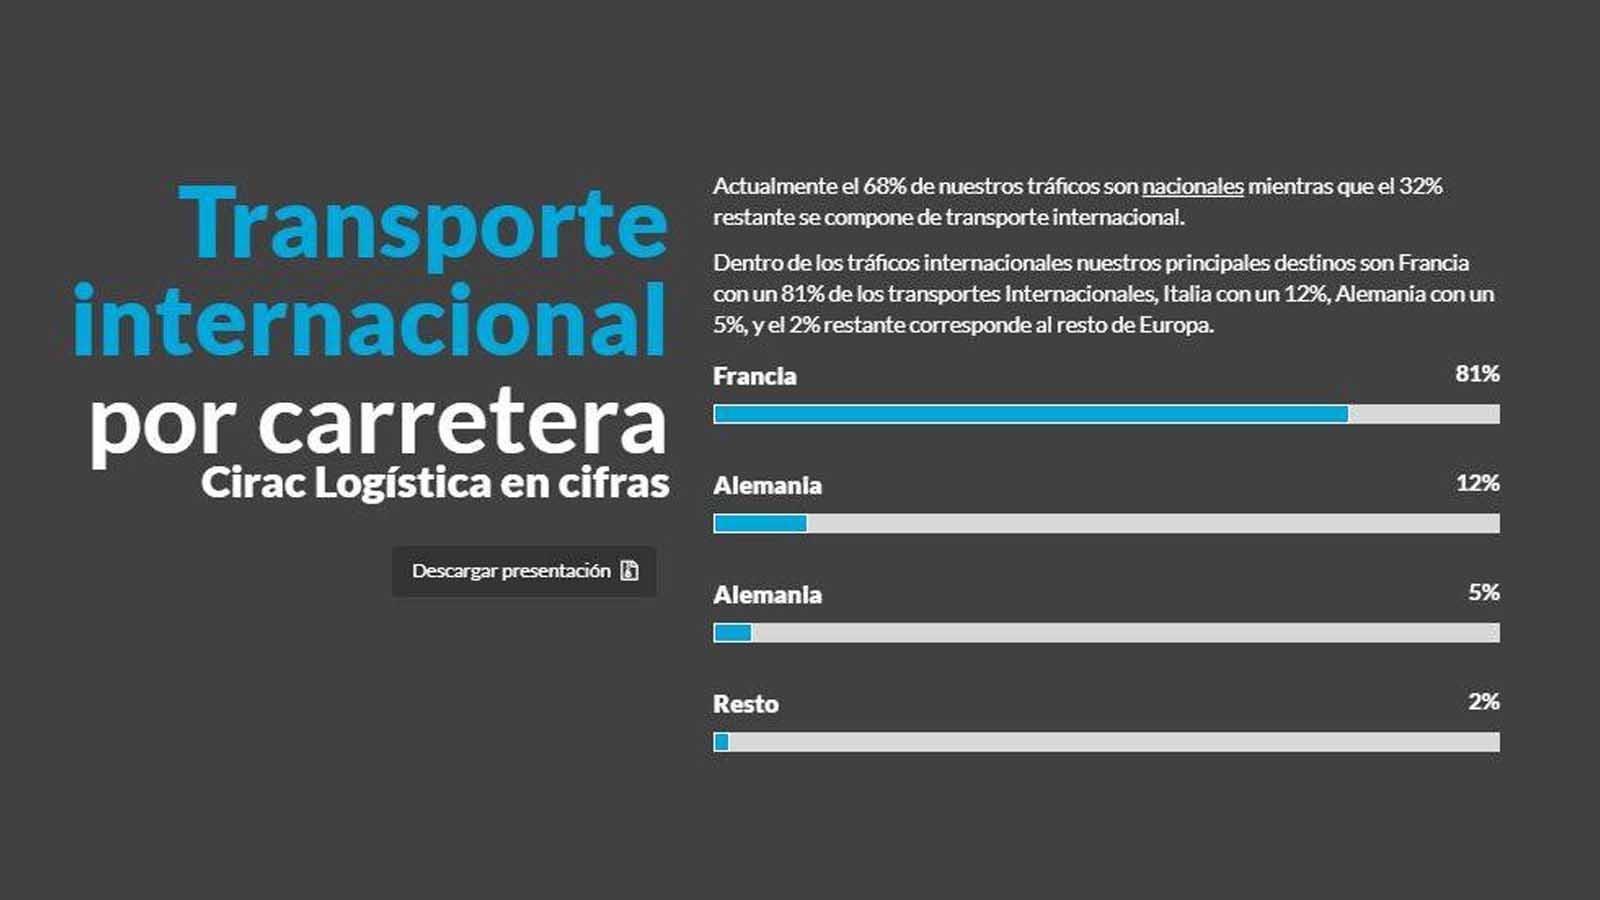 convenio transporte de mercancias por carretera